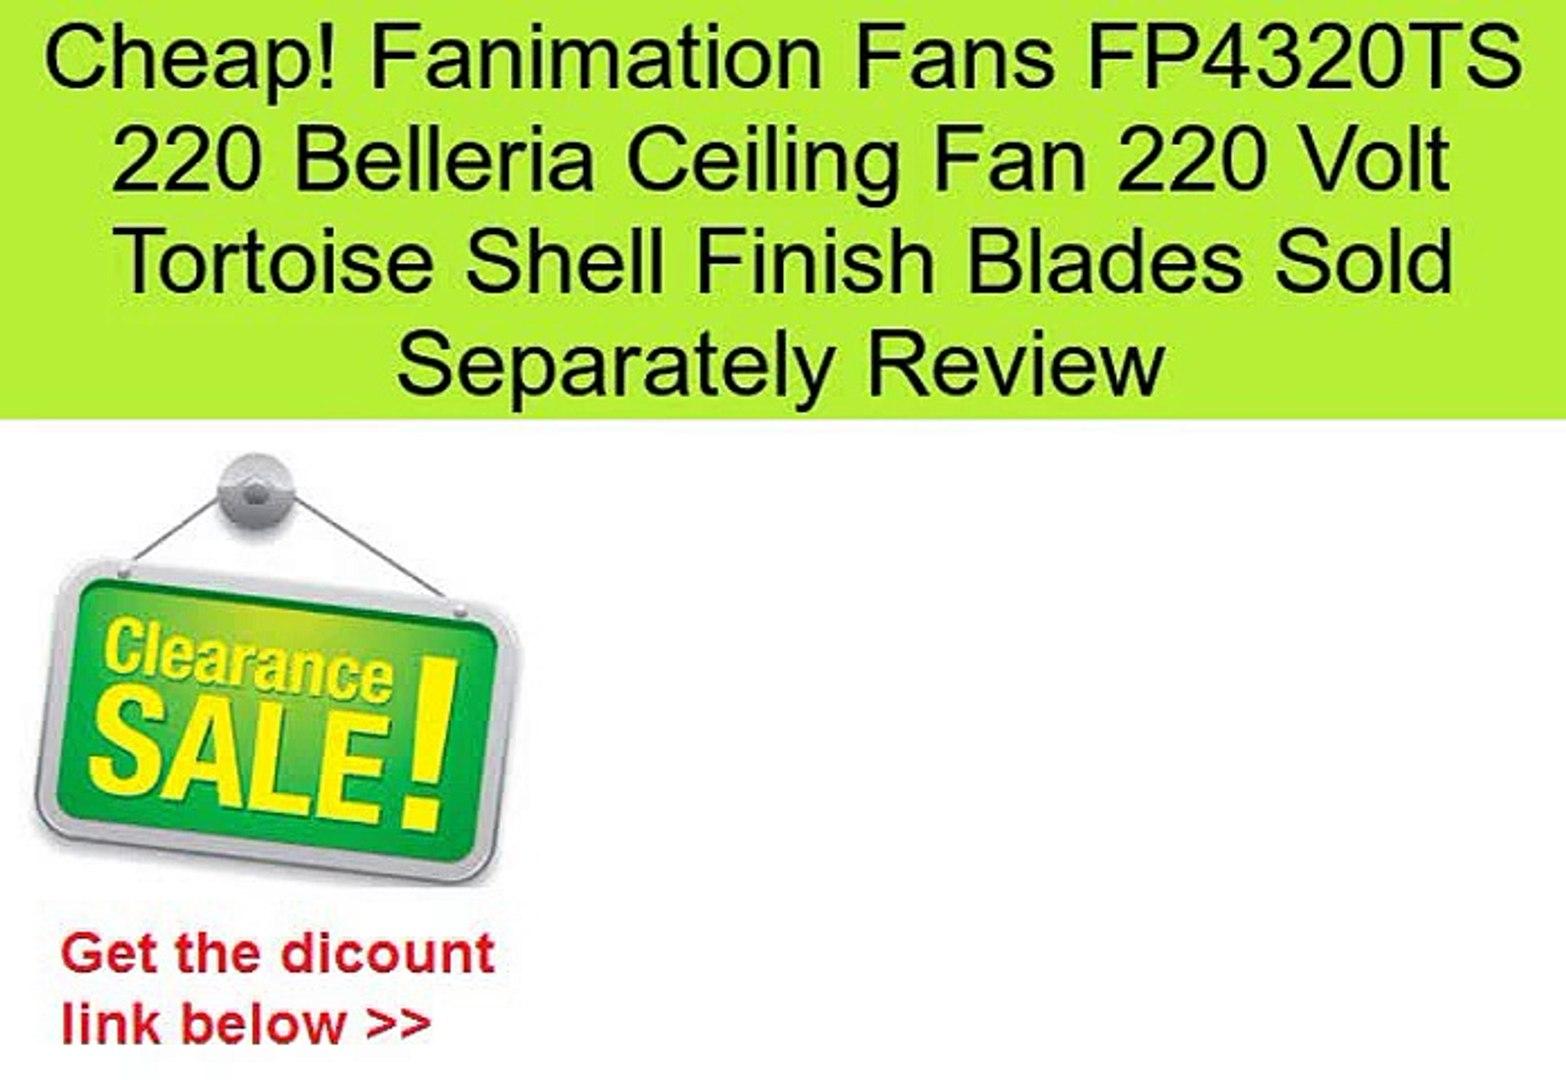 Fanimation Fans FP4320TS 220 Belleria Ceiling Fan 220 Volt Tortoise Shell Finish Blades Sold Separat